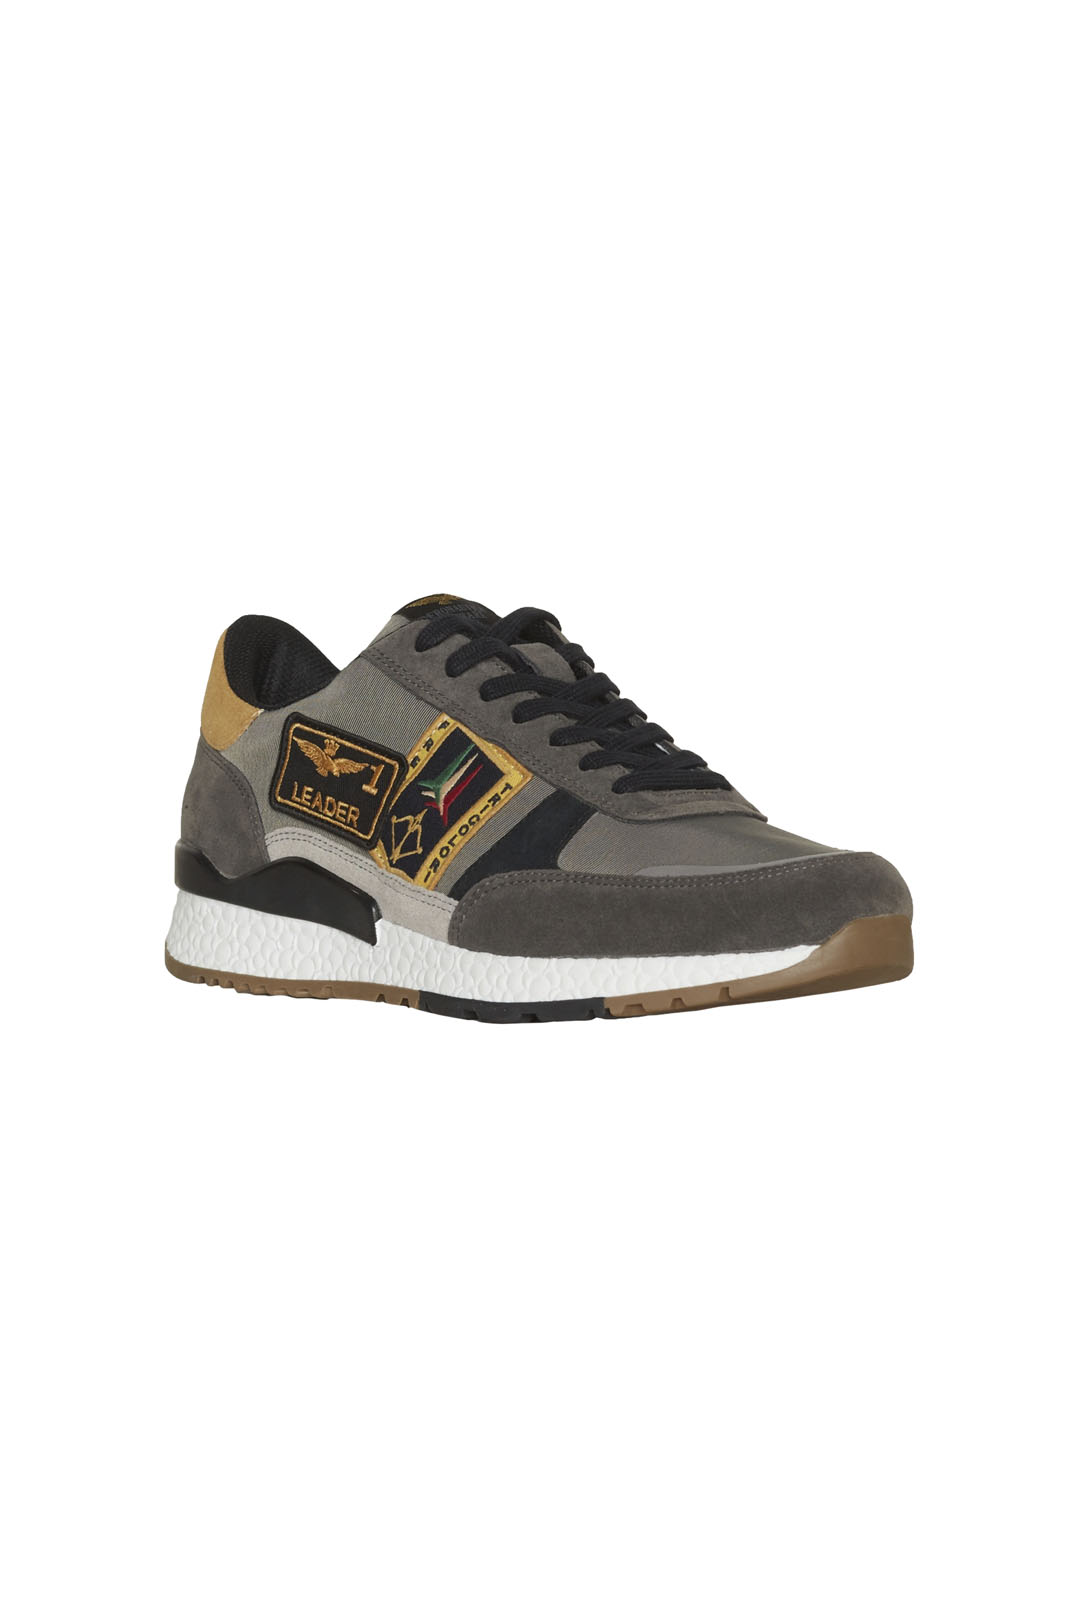 Frecce Tricolori sneakers with patches   1